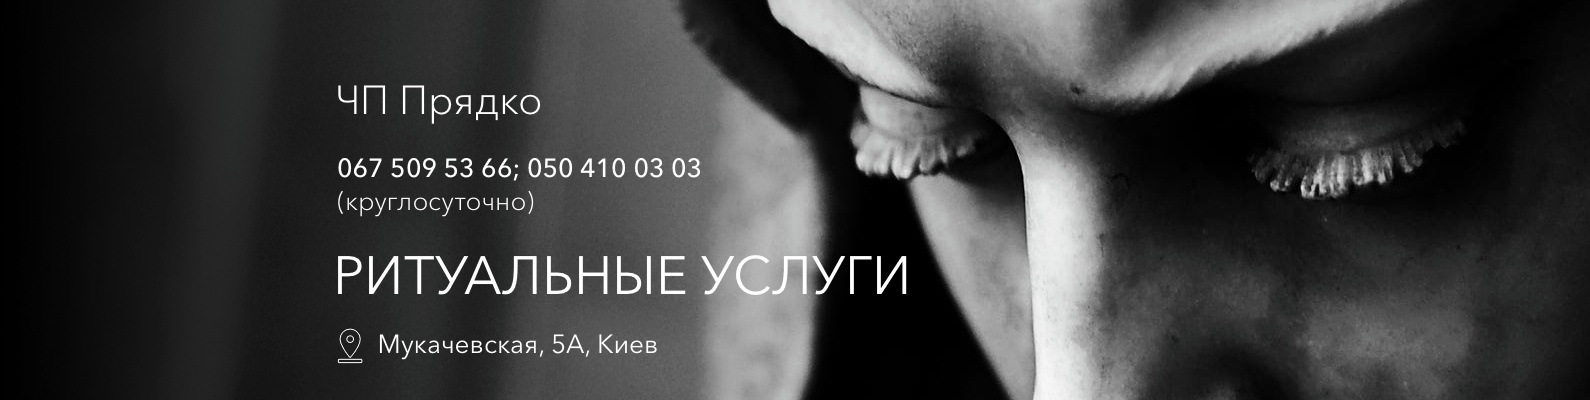 Ритуальні послуги, пам`ятники, скульптури Київ ПП Прядко